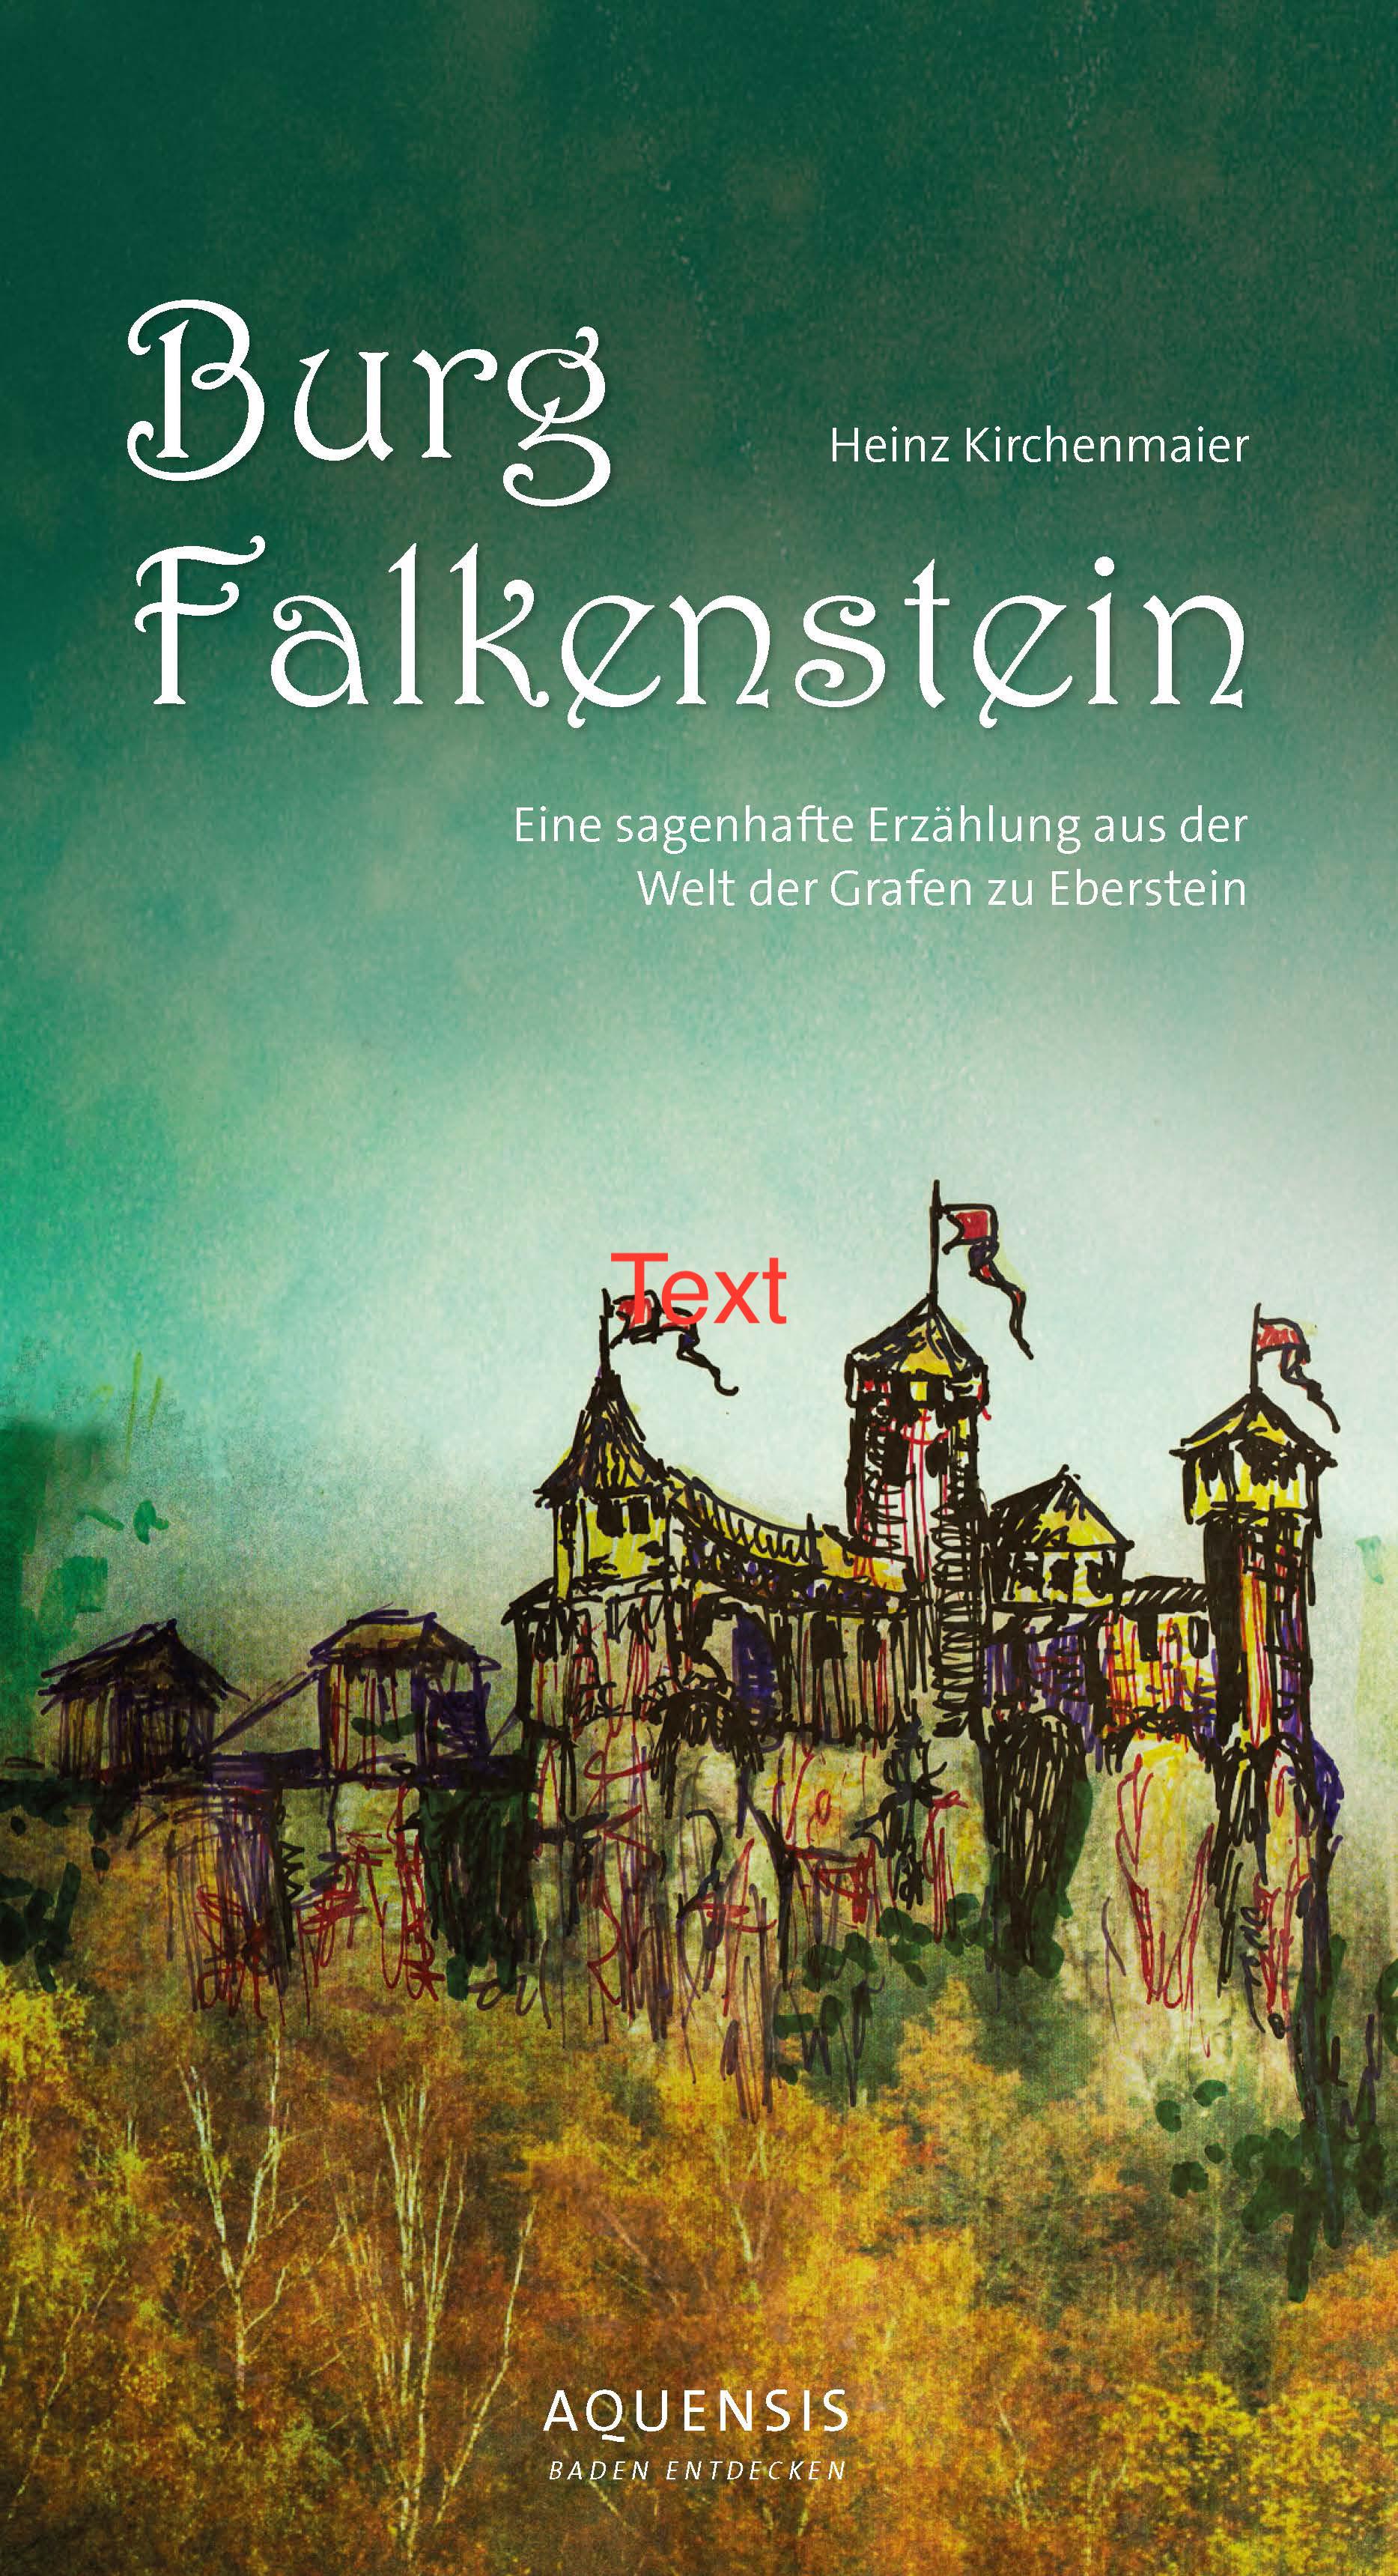 Heinz Kirchenmaier Burg Falkenstein недорого